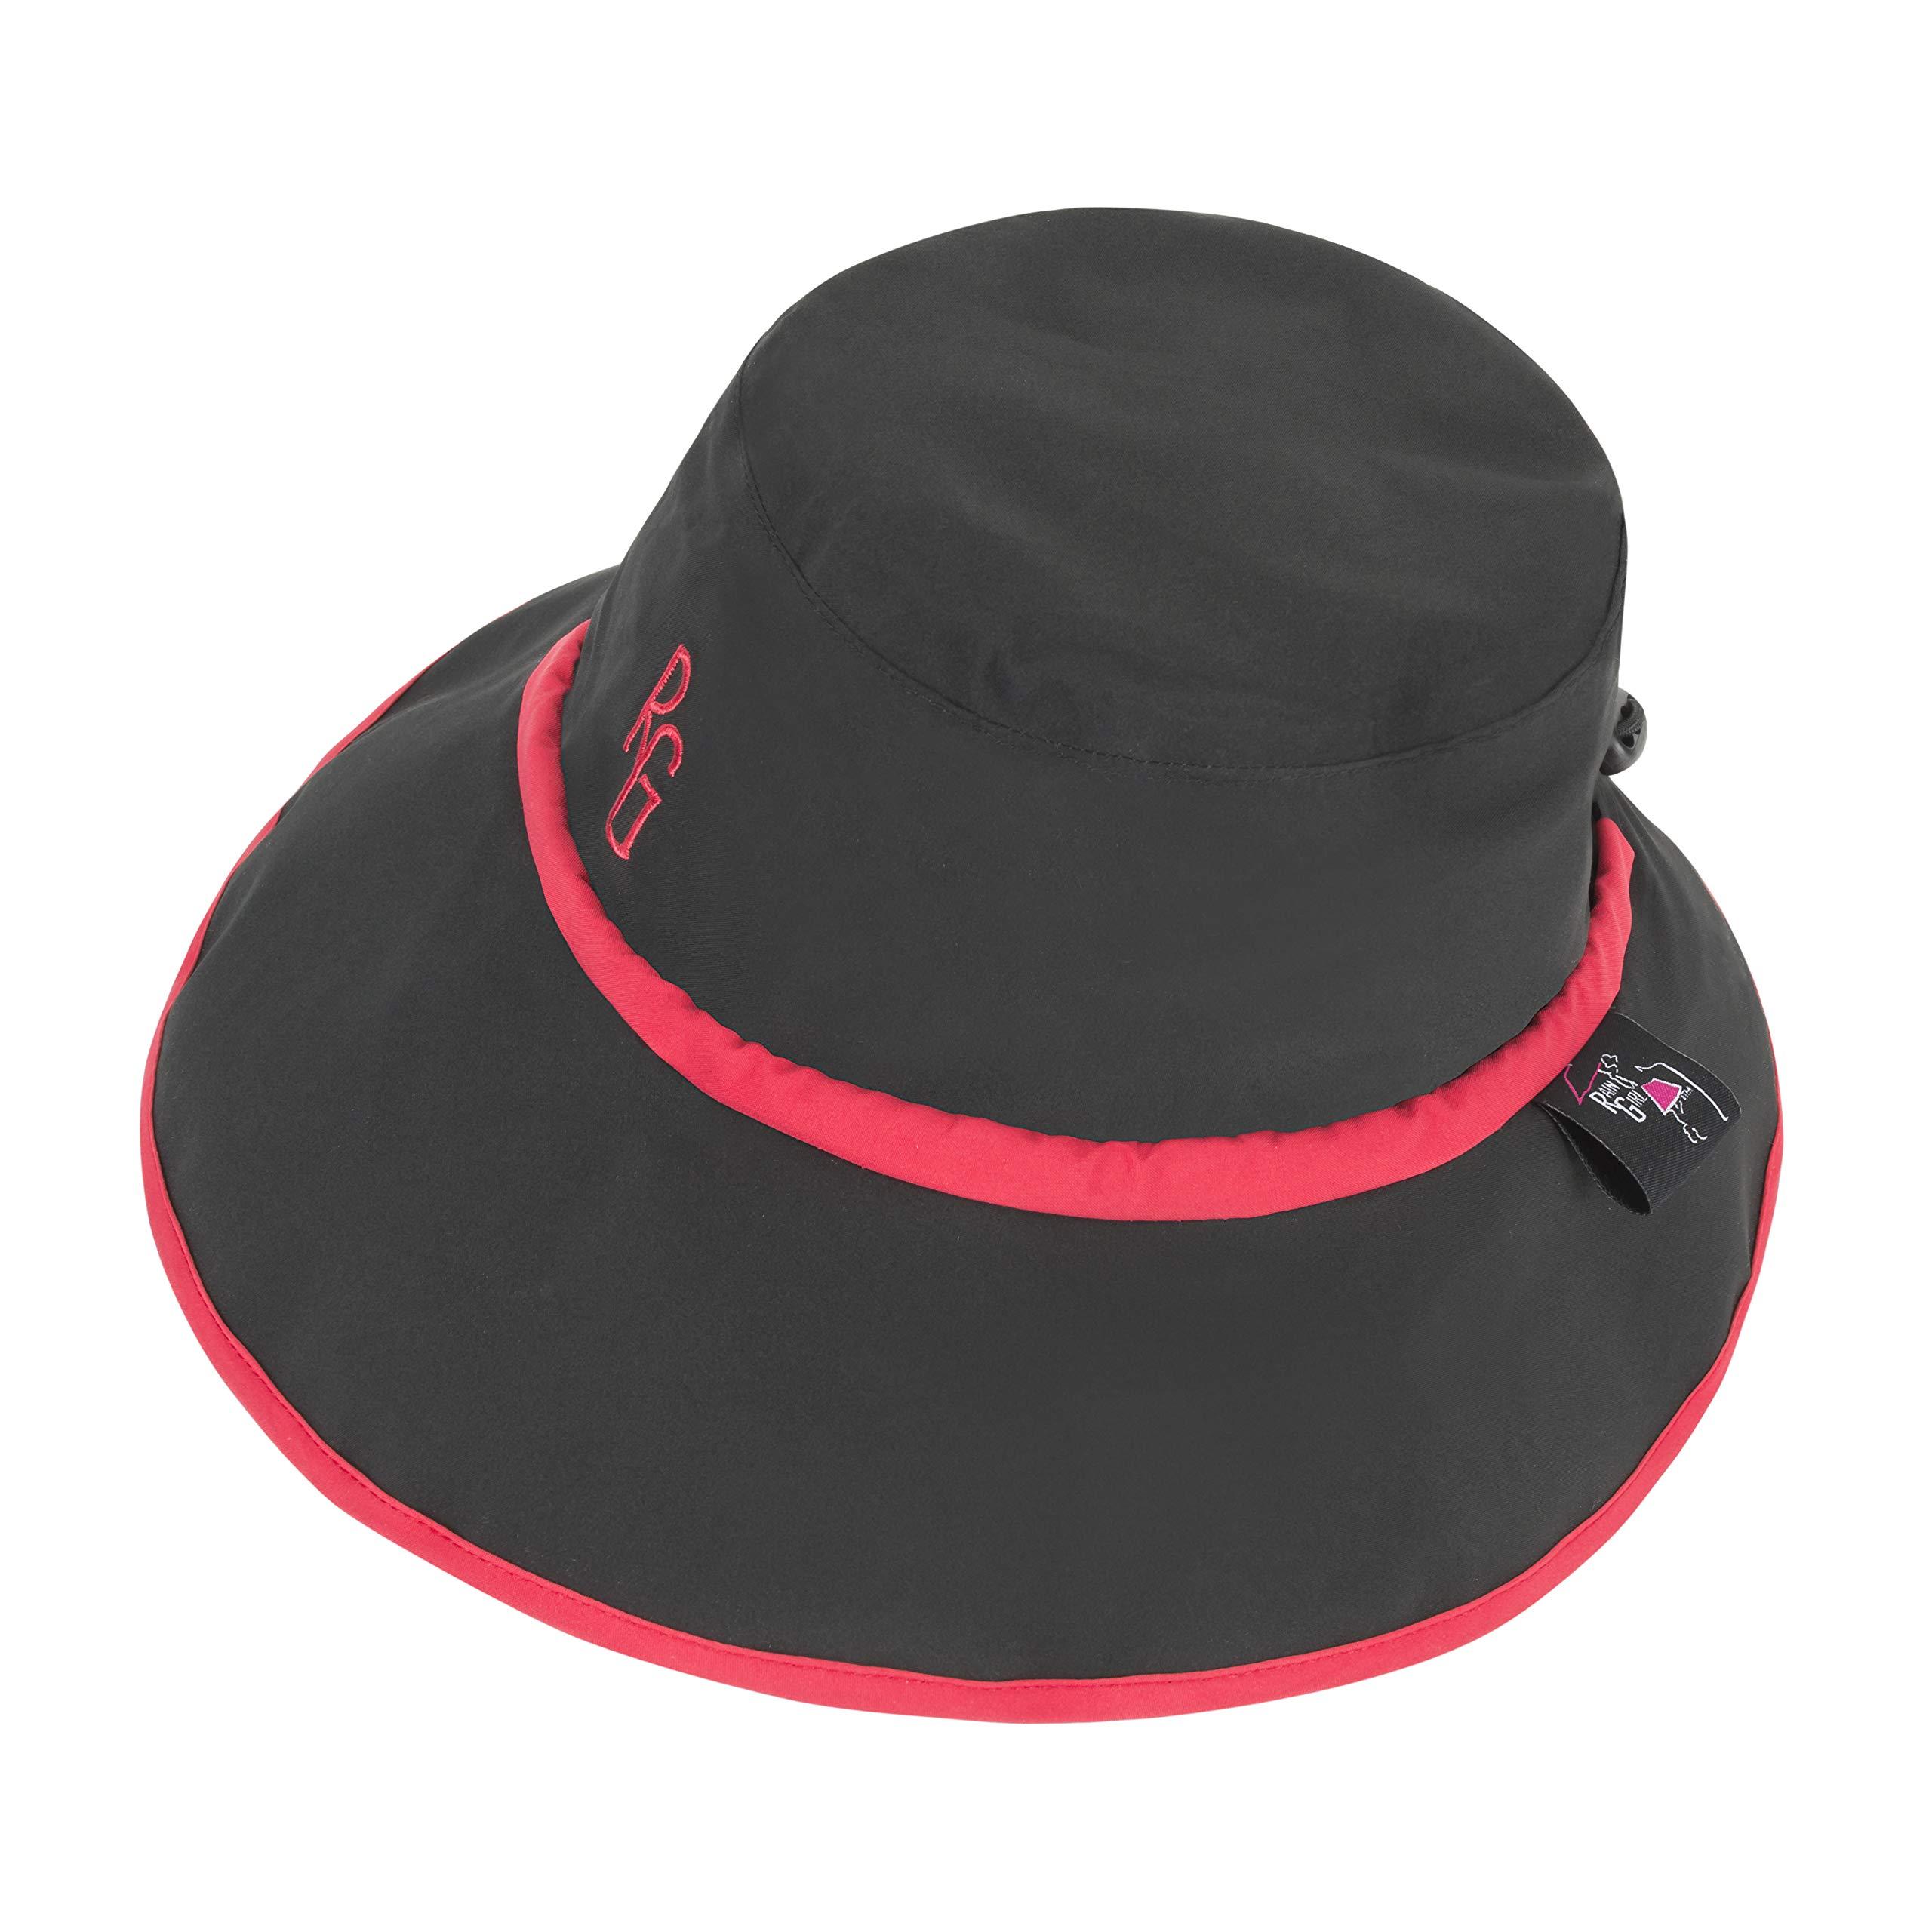 Women's Golf Rain Hat Black with Red Trim by Rain Girl